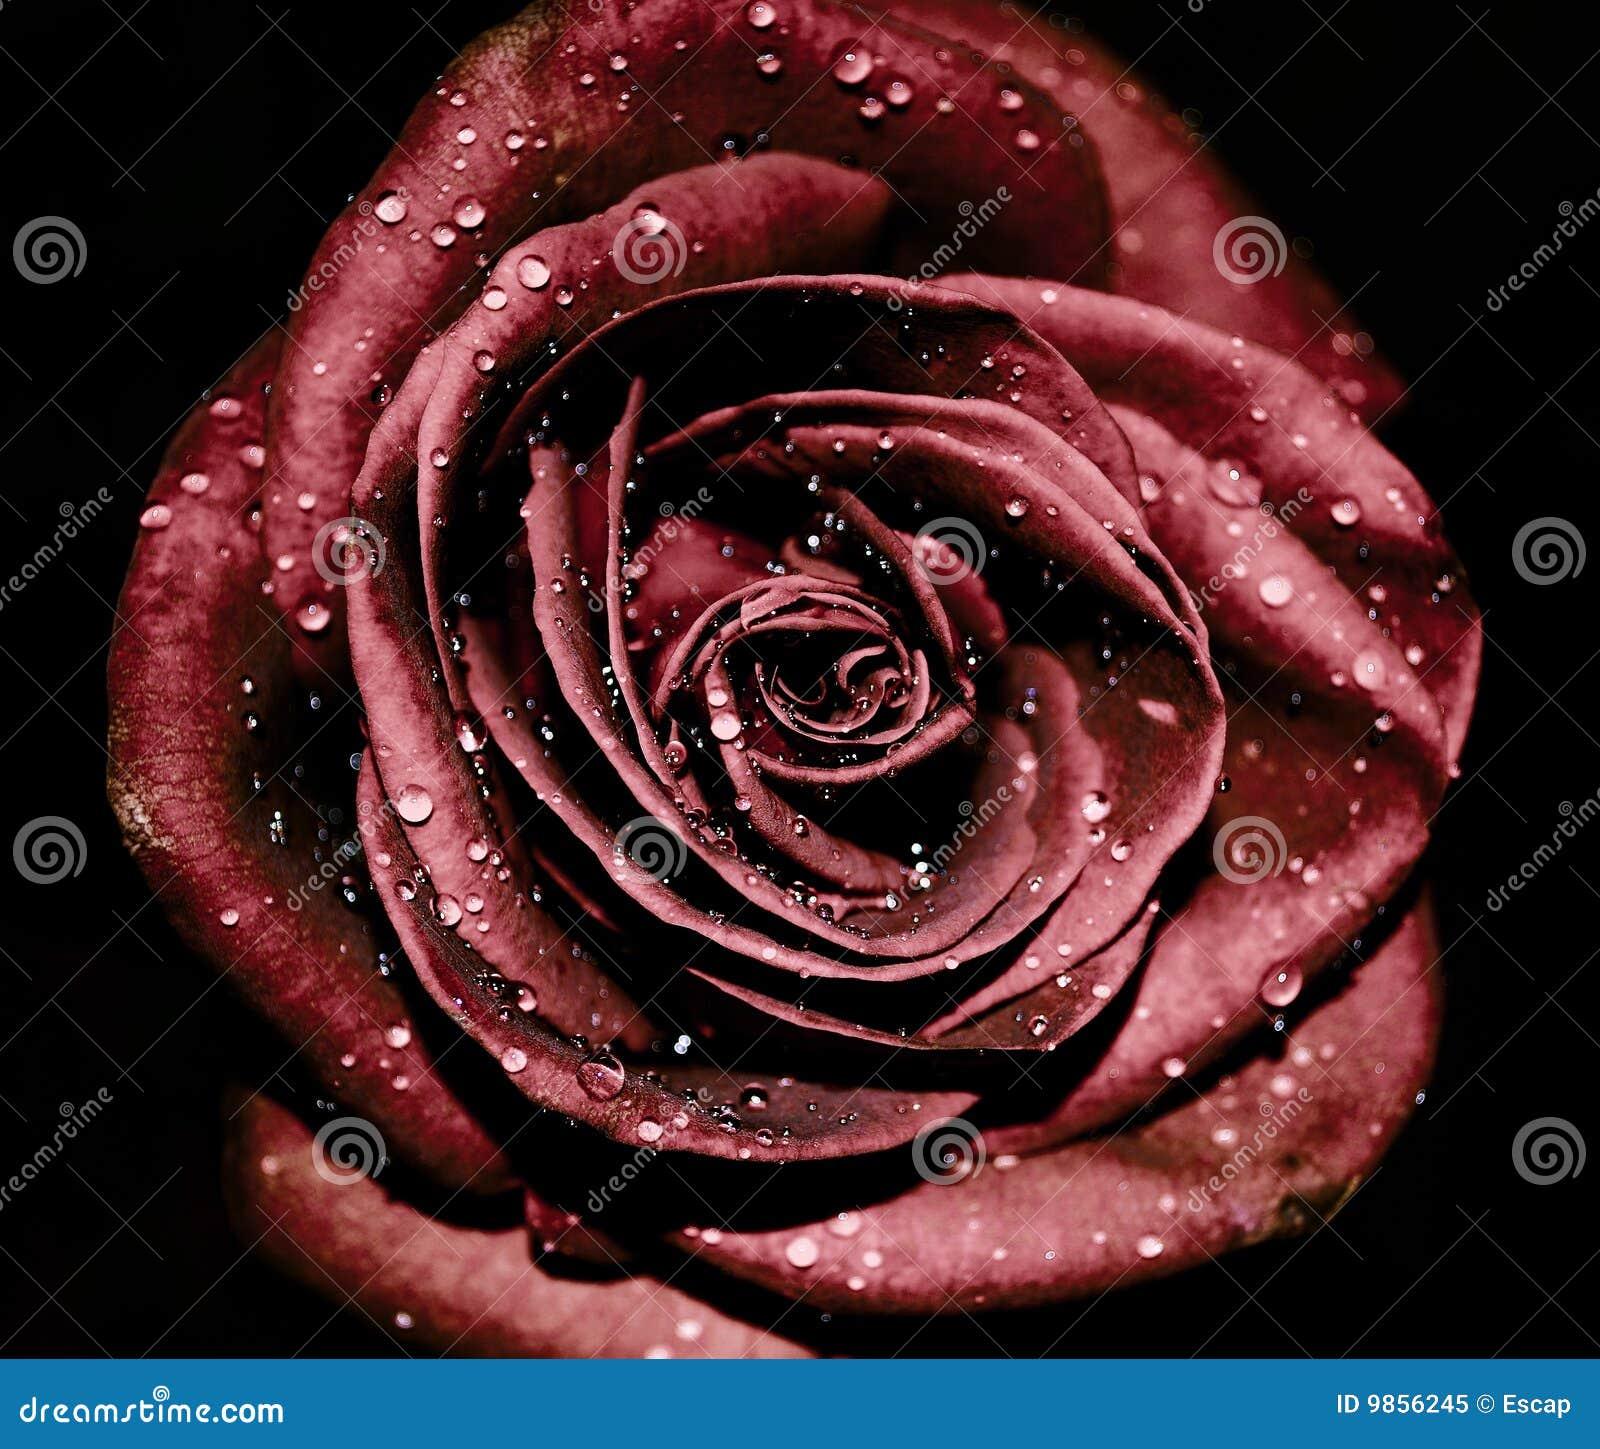 Cry rose